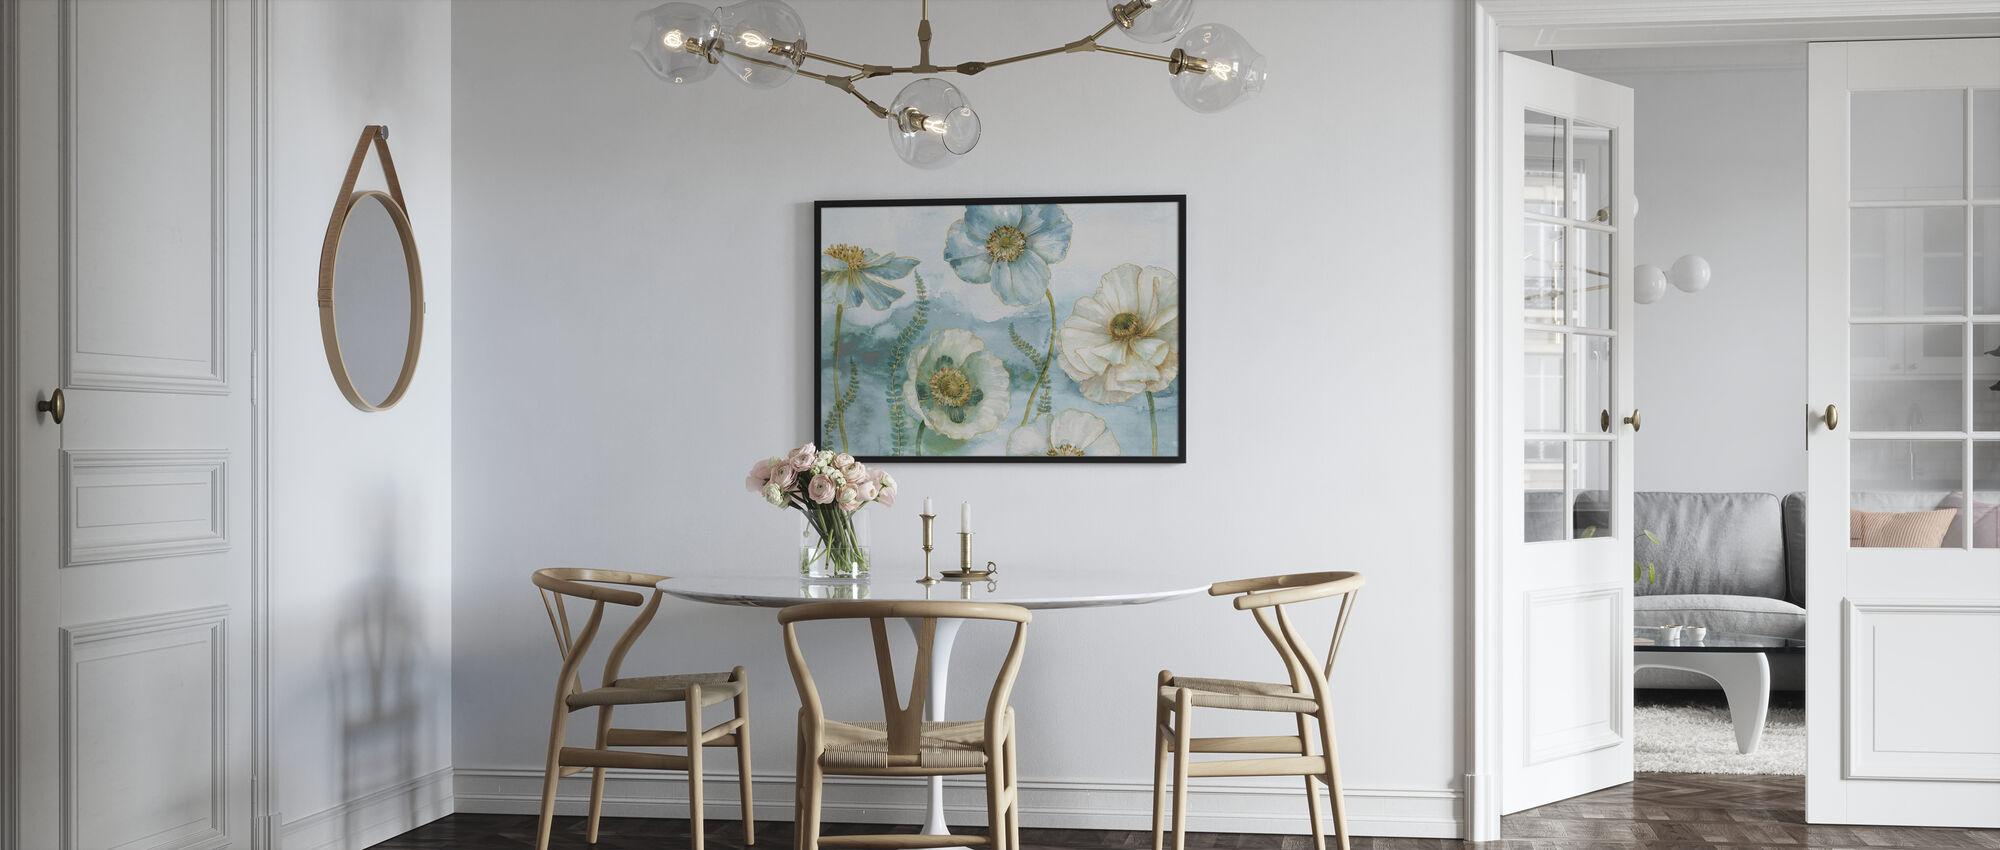 My Greenhouse Flowers - Framed print - Kitchen